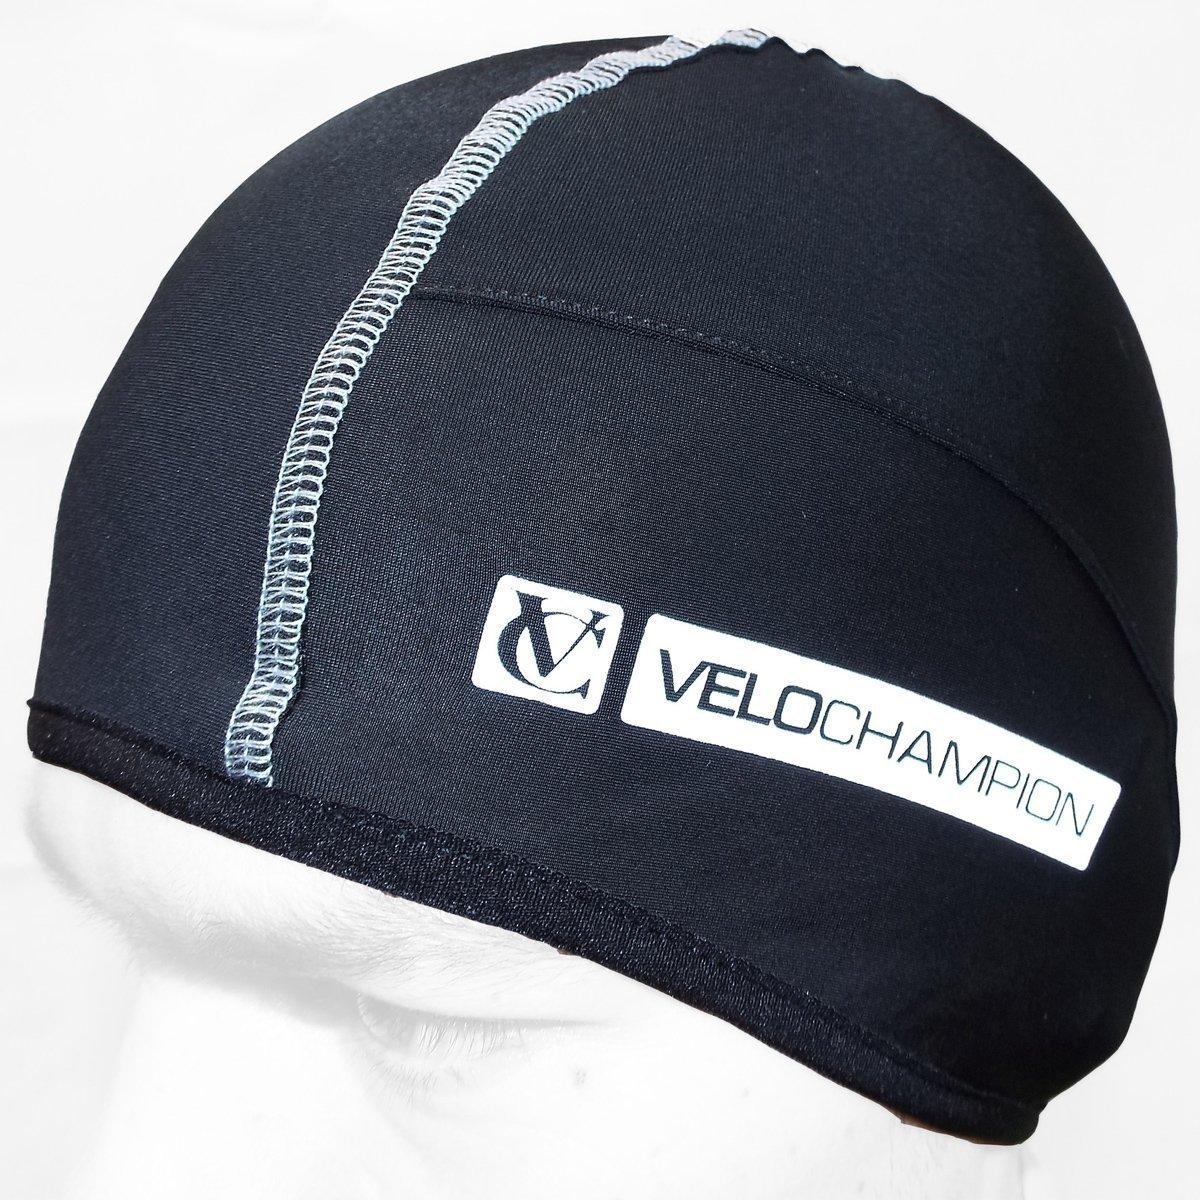 VeloChampion Thermo Tech Cycling Skull Cap - Under Helmet Hat - Black 2219